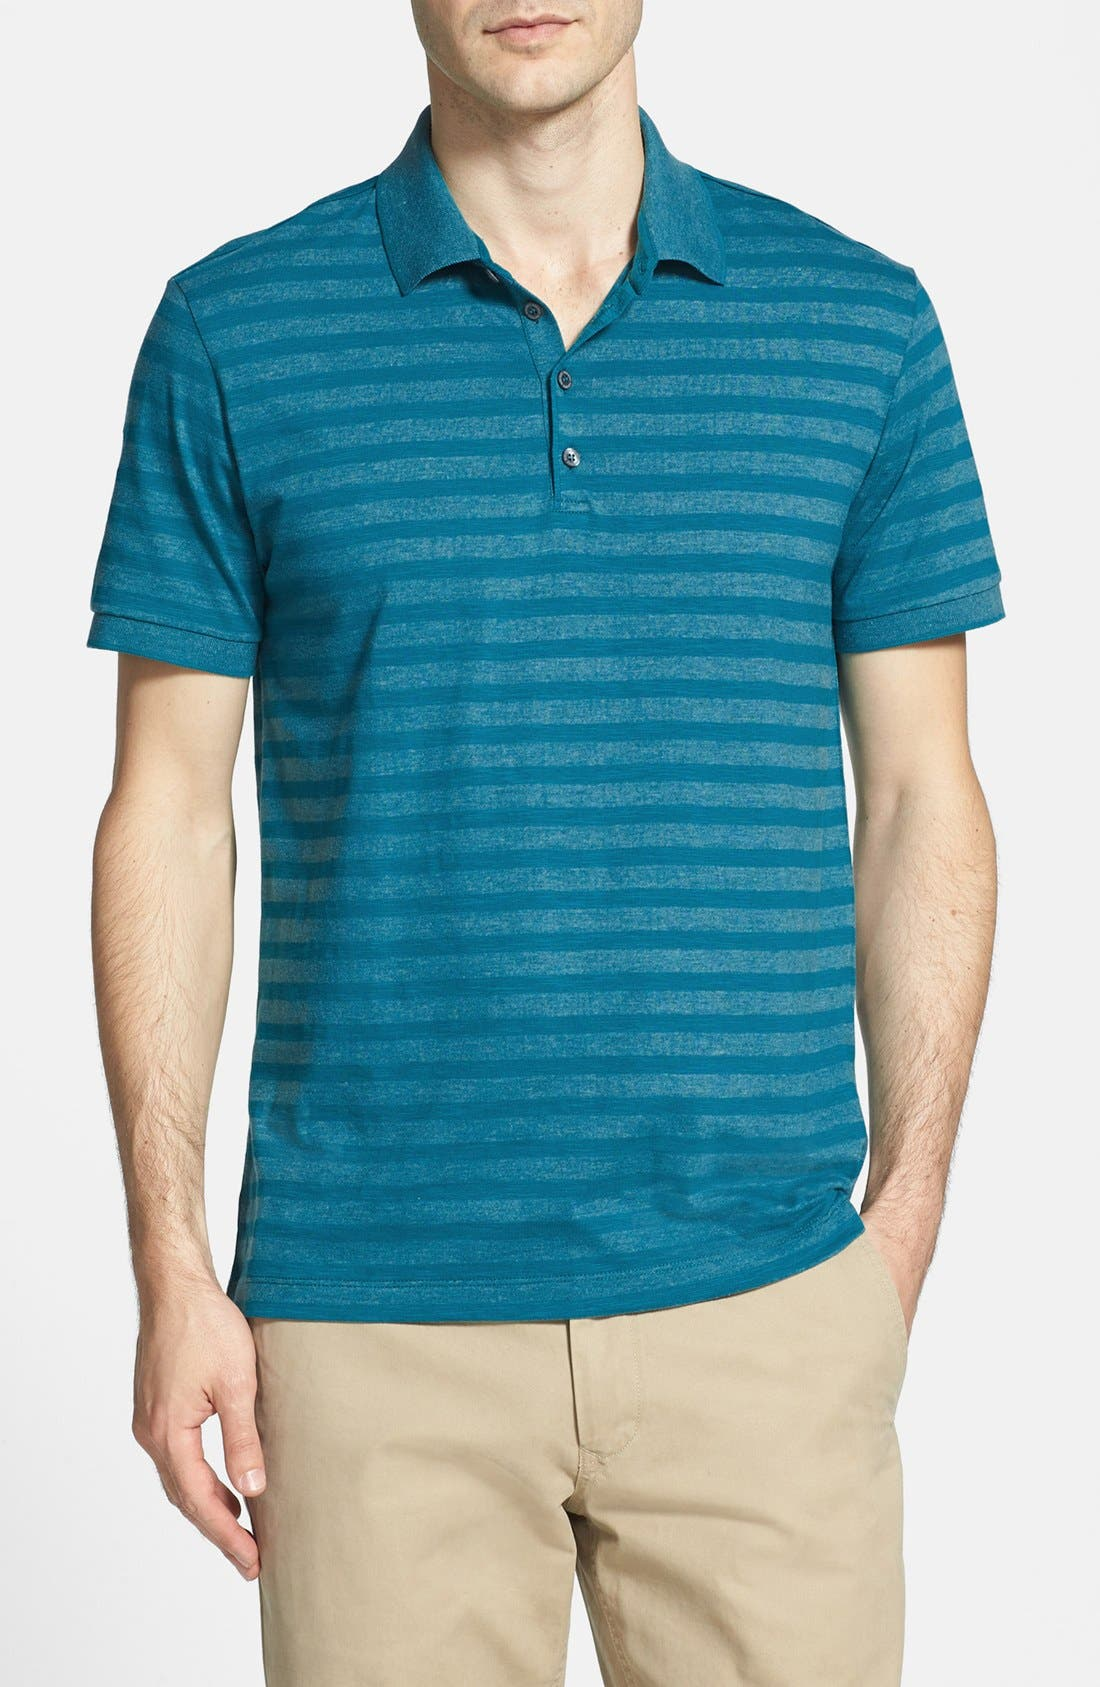 Main Image - BOSS HUGO BOSS 'Prato 25' Cotton Blend Polo Shirt